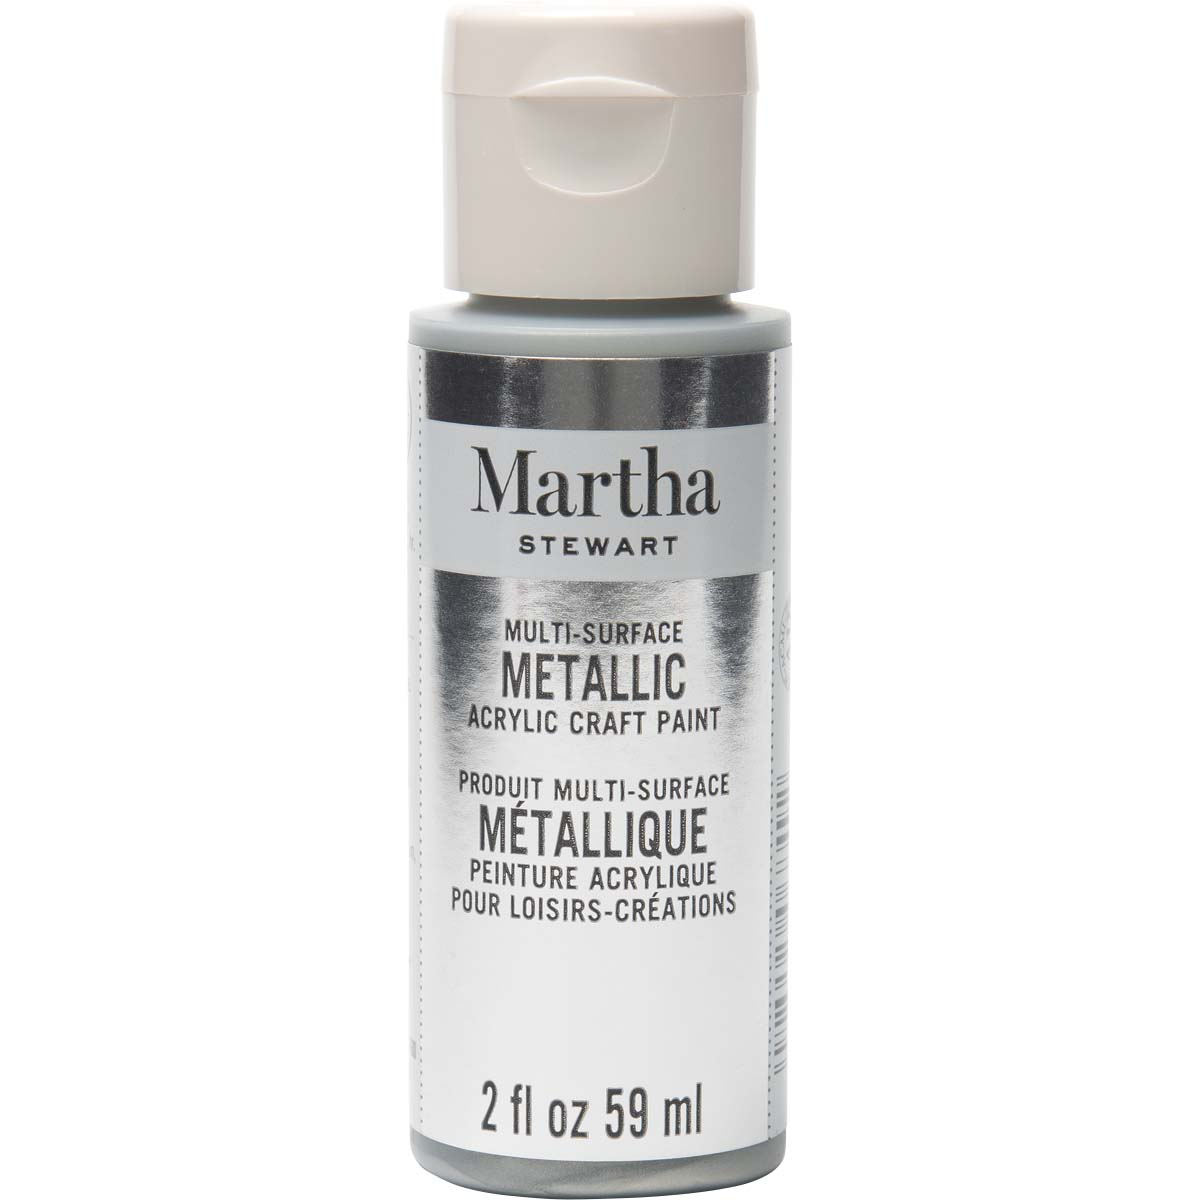 Martha Stewart ® Multi-Surface Metallic Acrylic Craft Paint - Sterling, 2 oz.